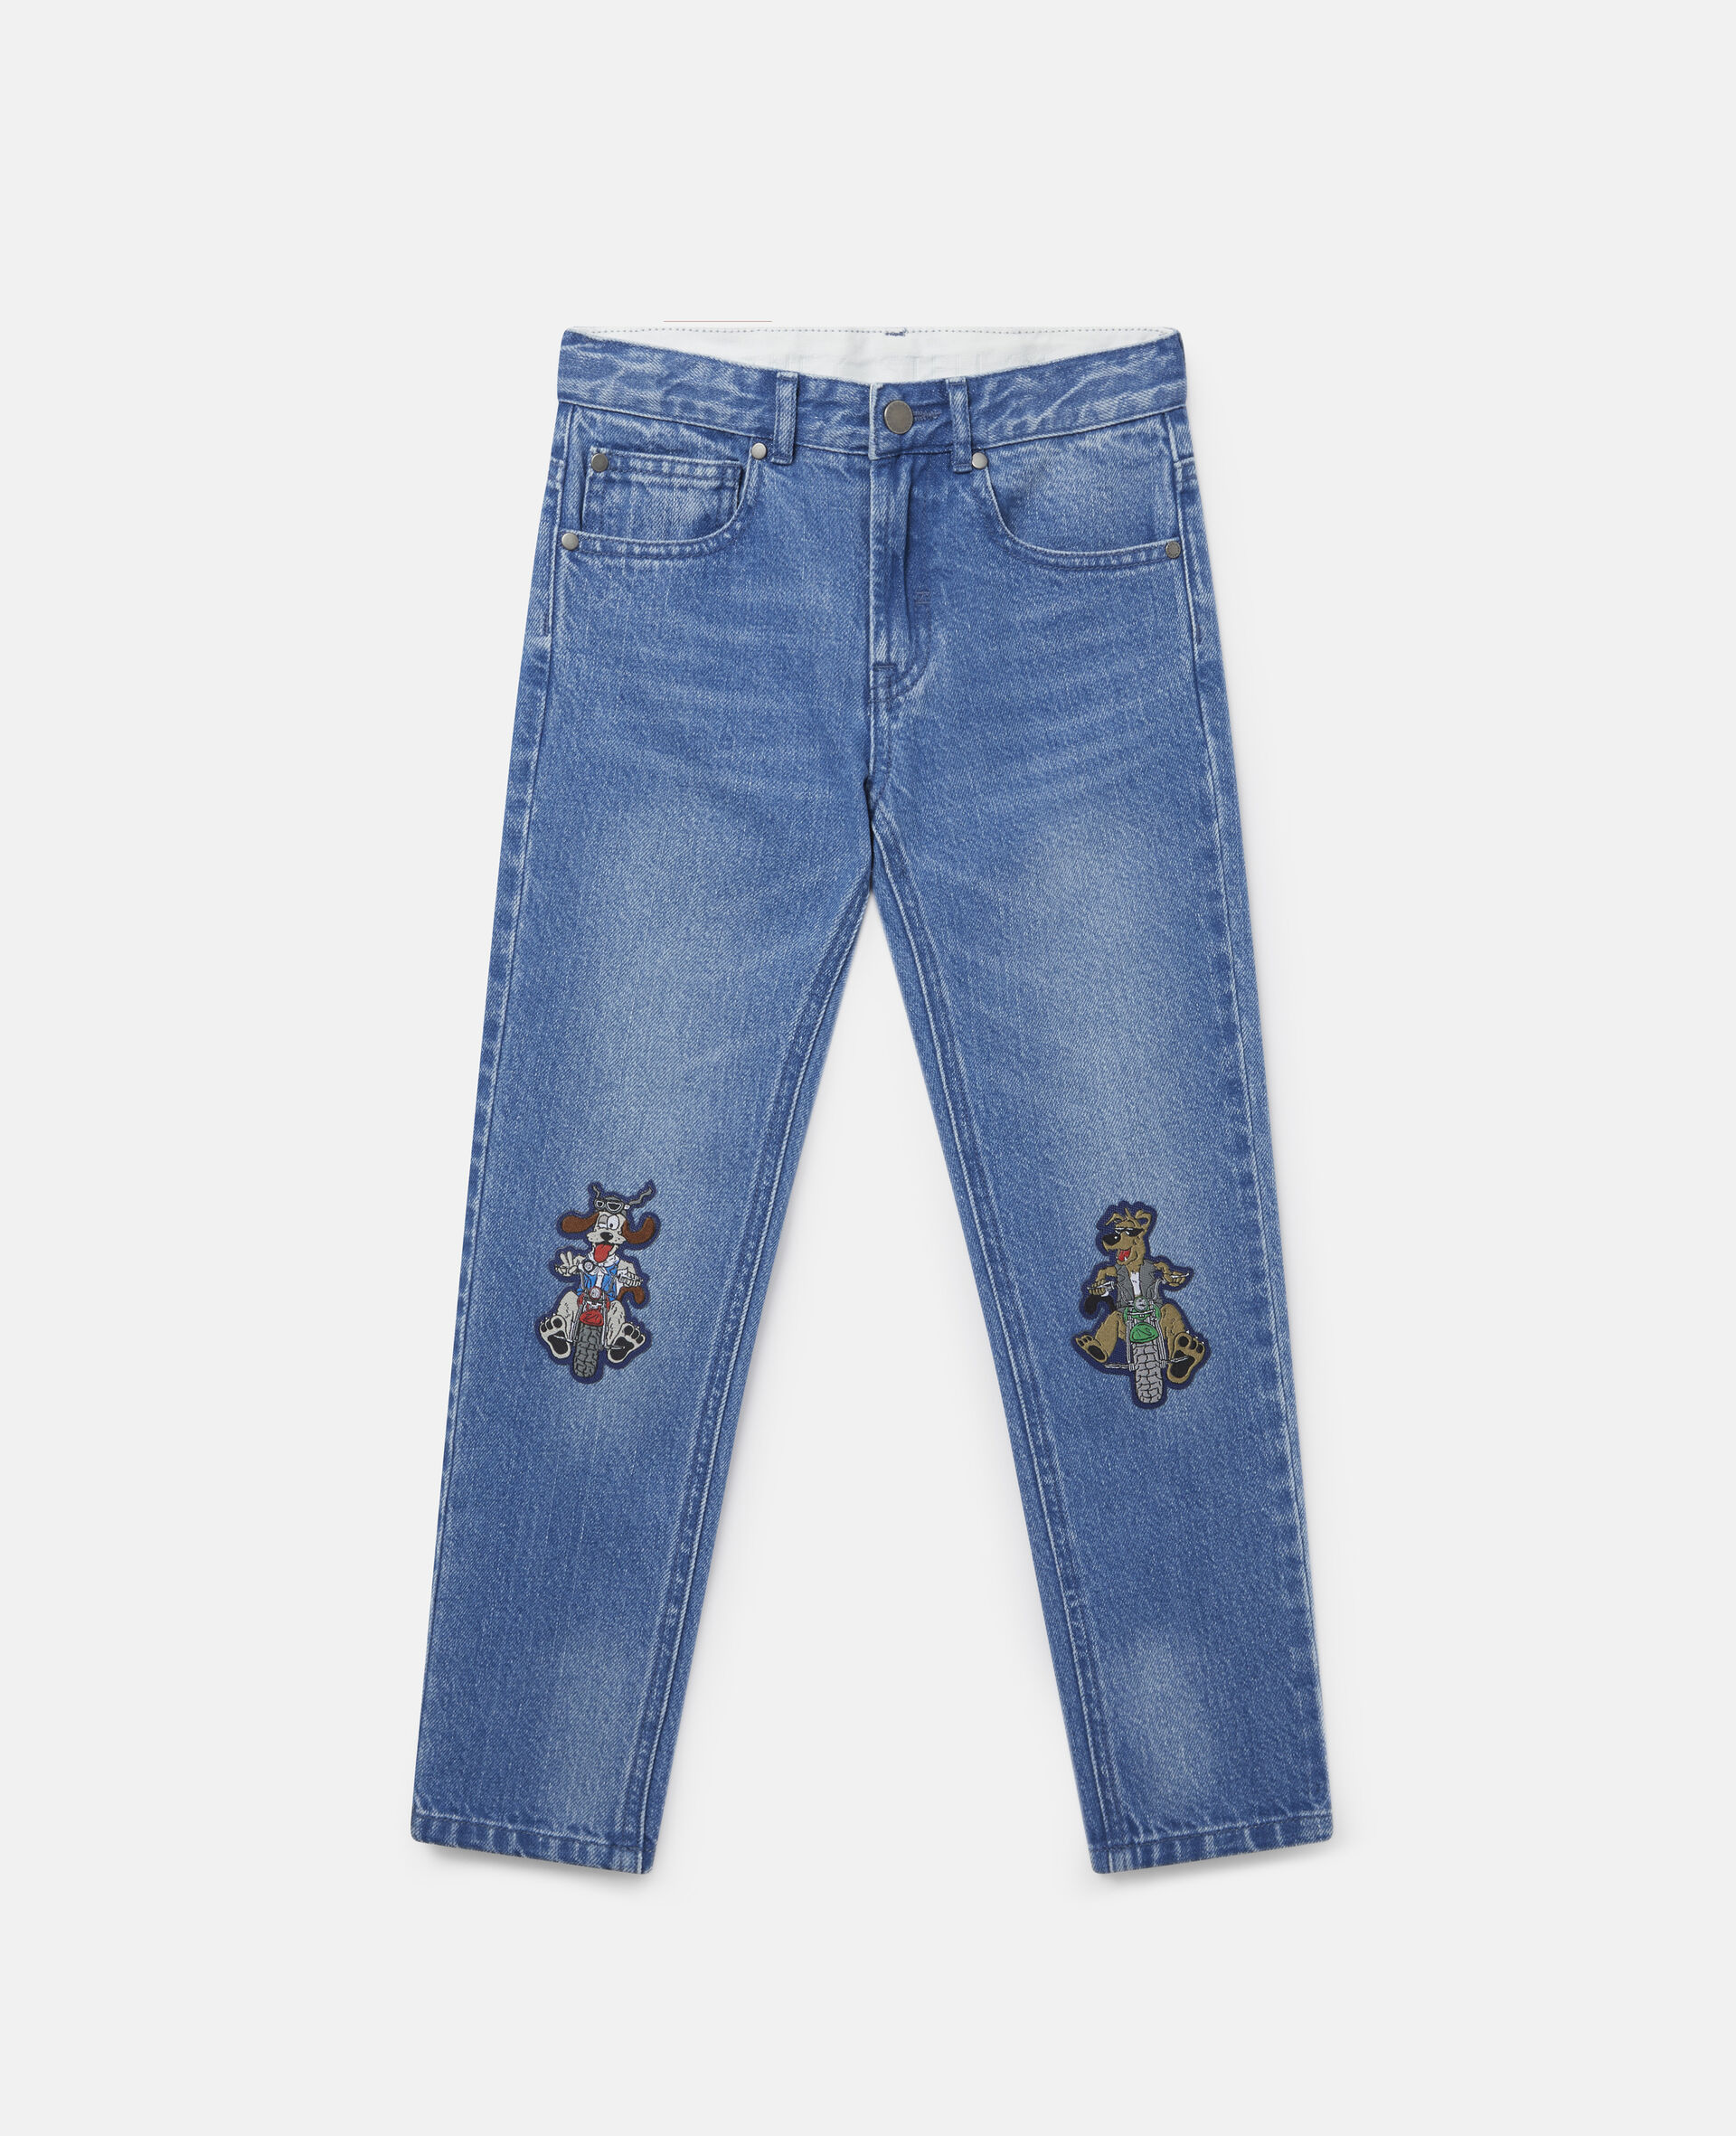 Doggies Badges Denim Trousers-Blue-large image number 0